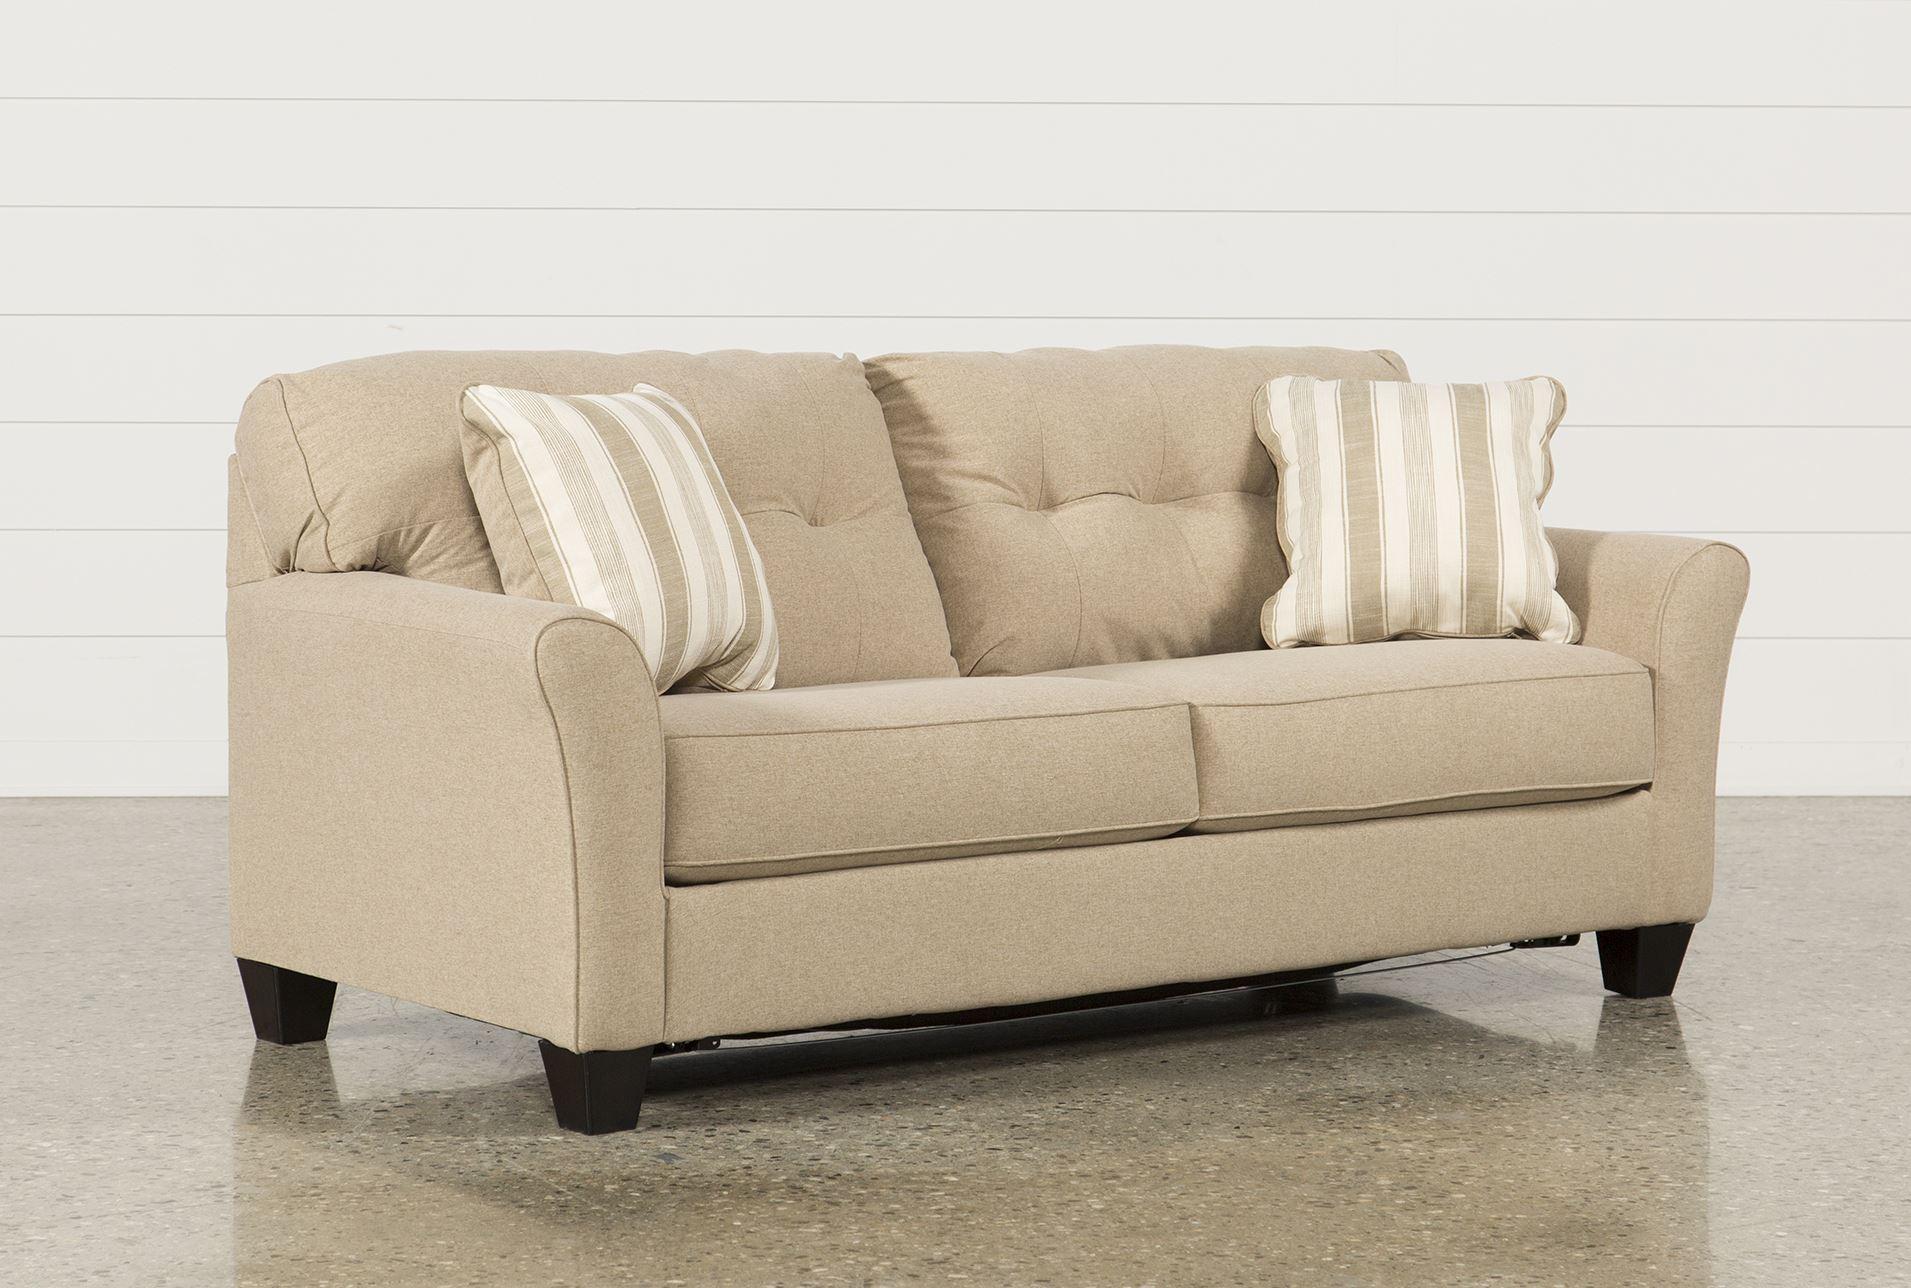 boardwalk sofa review leather with wood trim pier one alton sleeper reviews energywarden